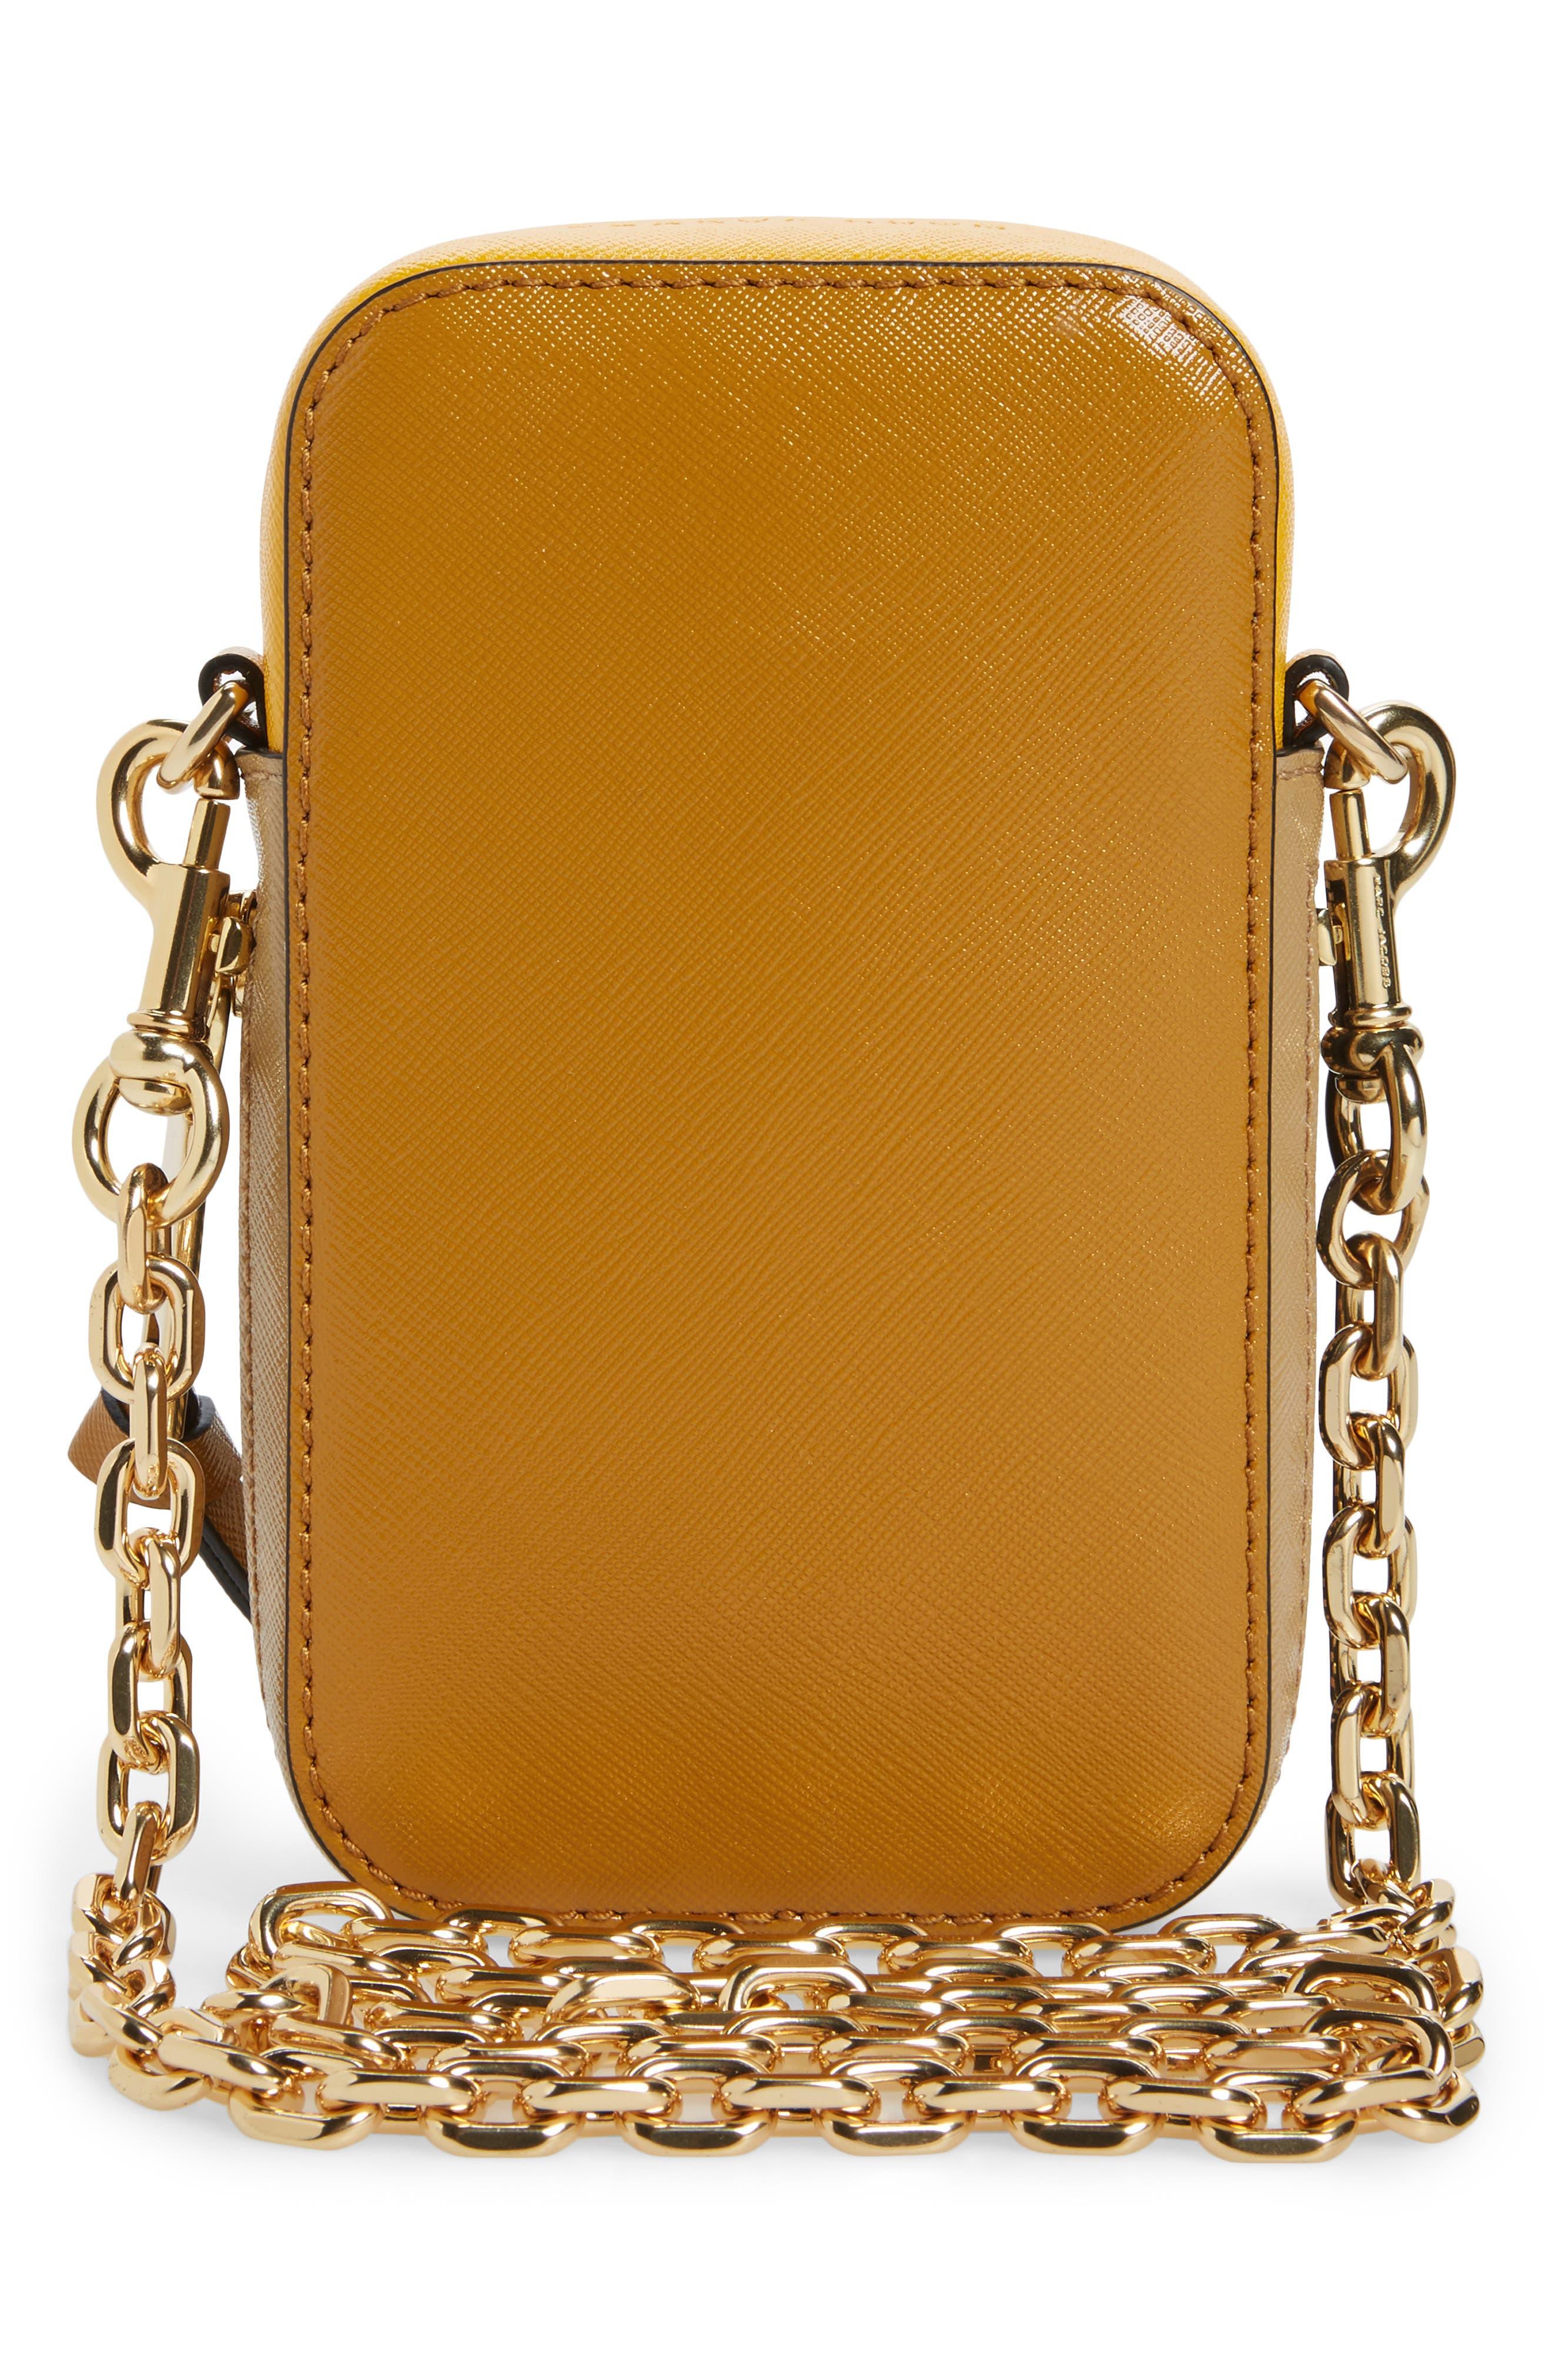 Hot Shot Saffiano Leather Shoulder Bag,                             Alternate thumbnail 11, color,